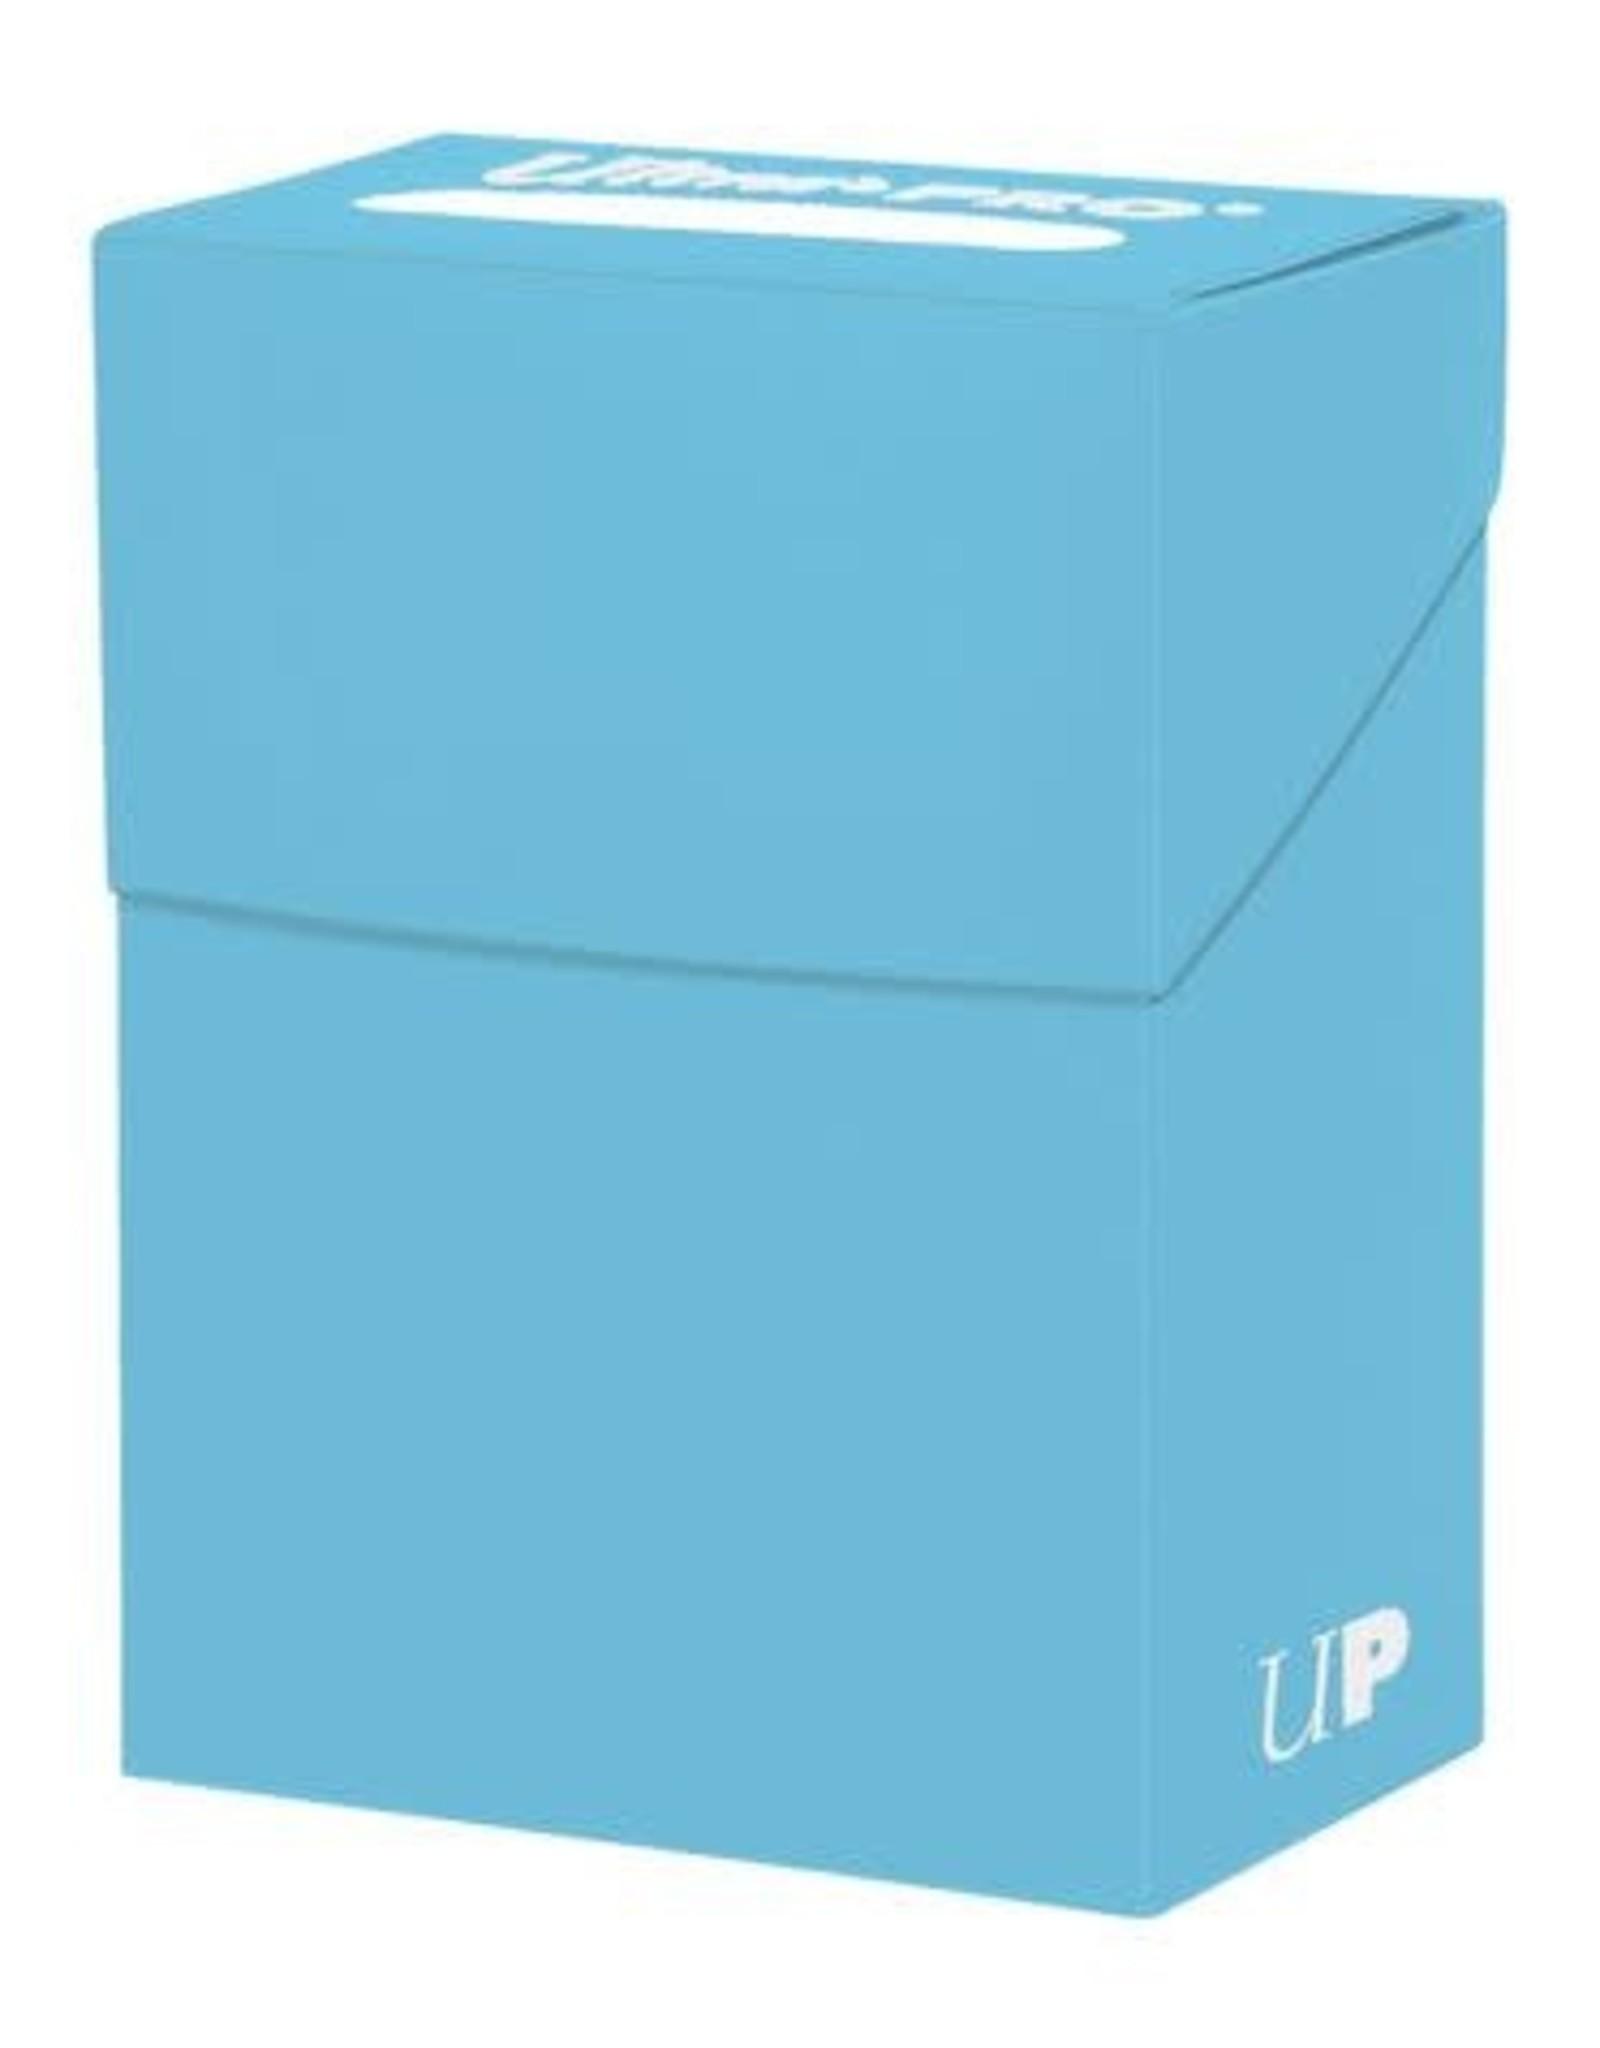 Ultra Pro Deck Box Light Blue